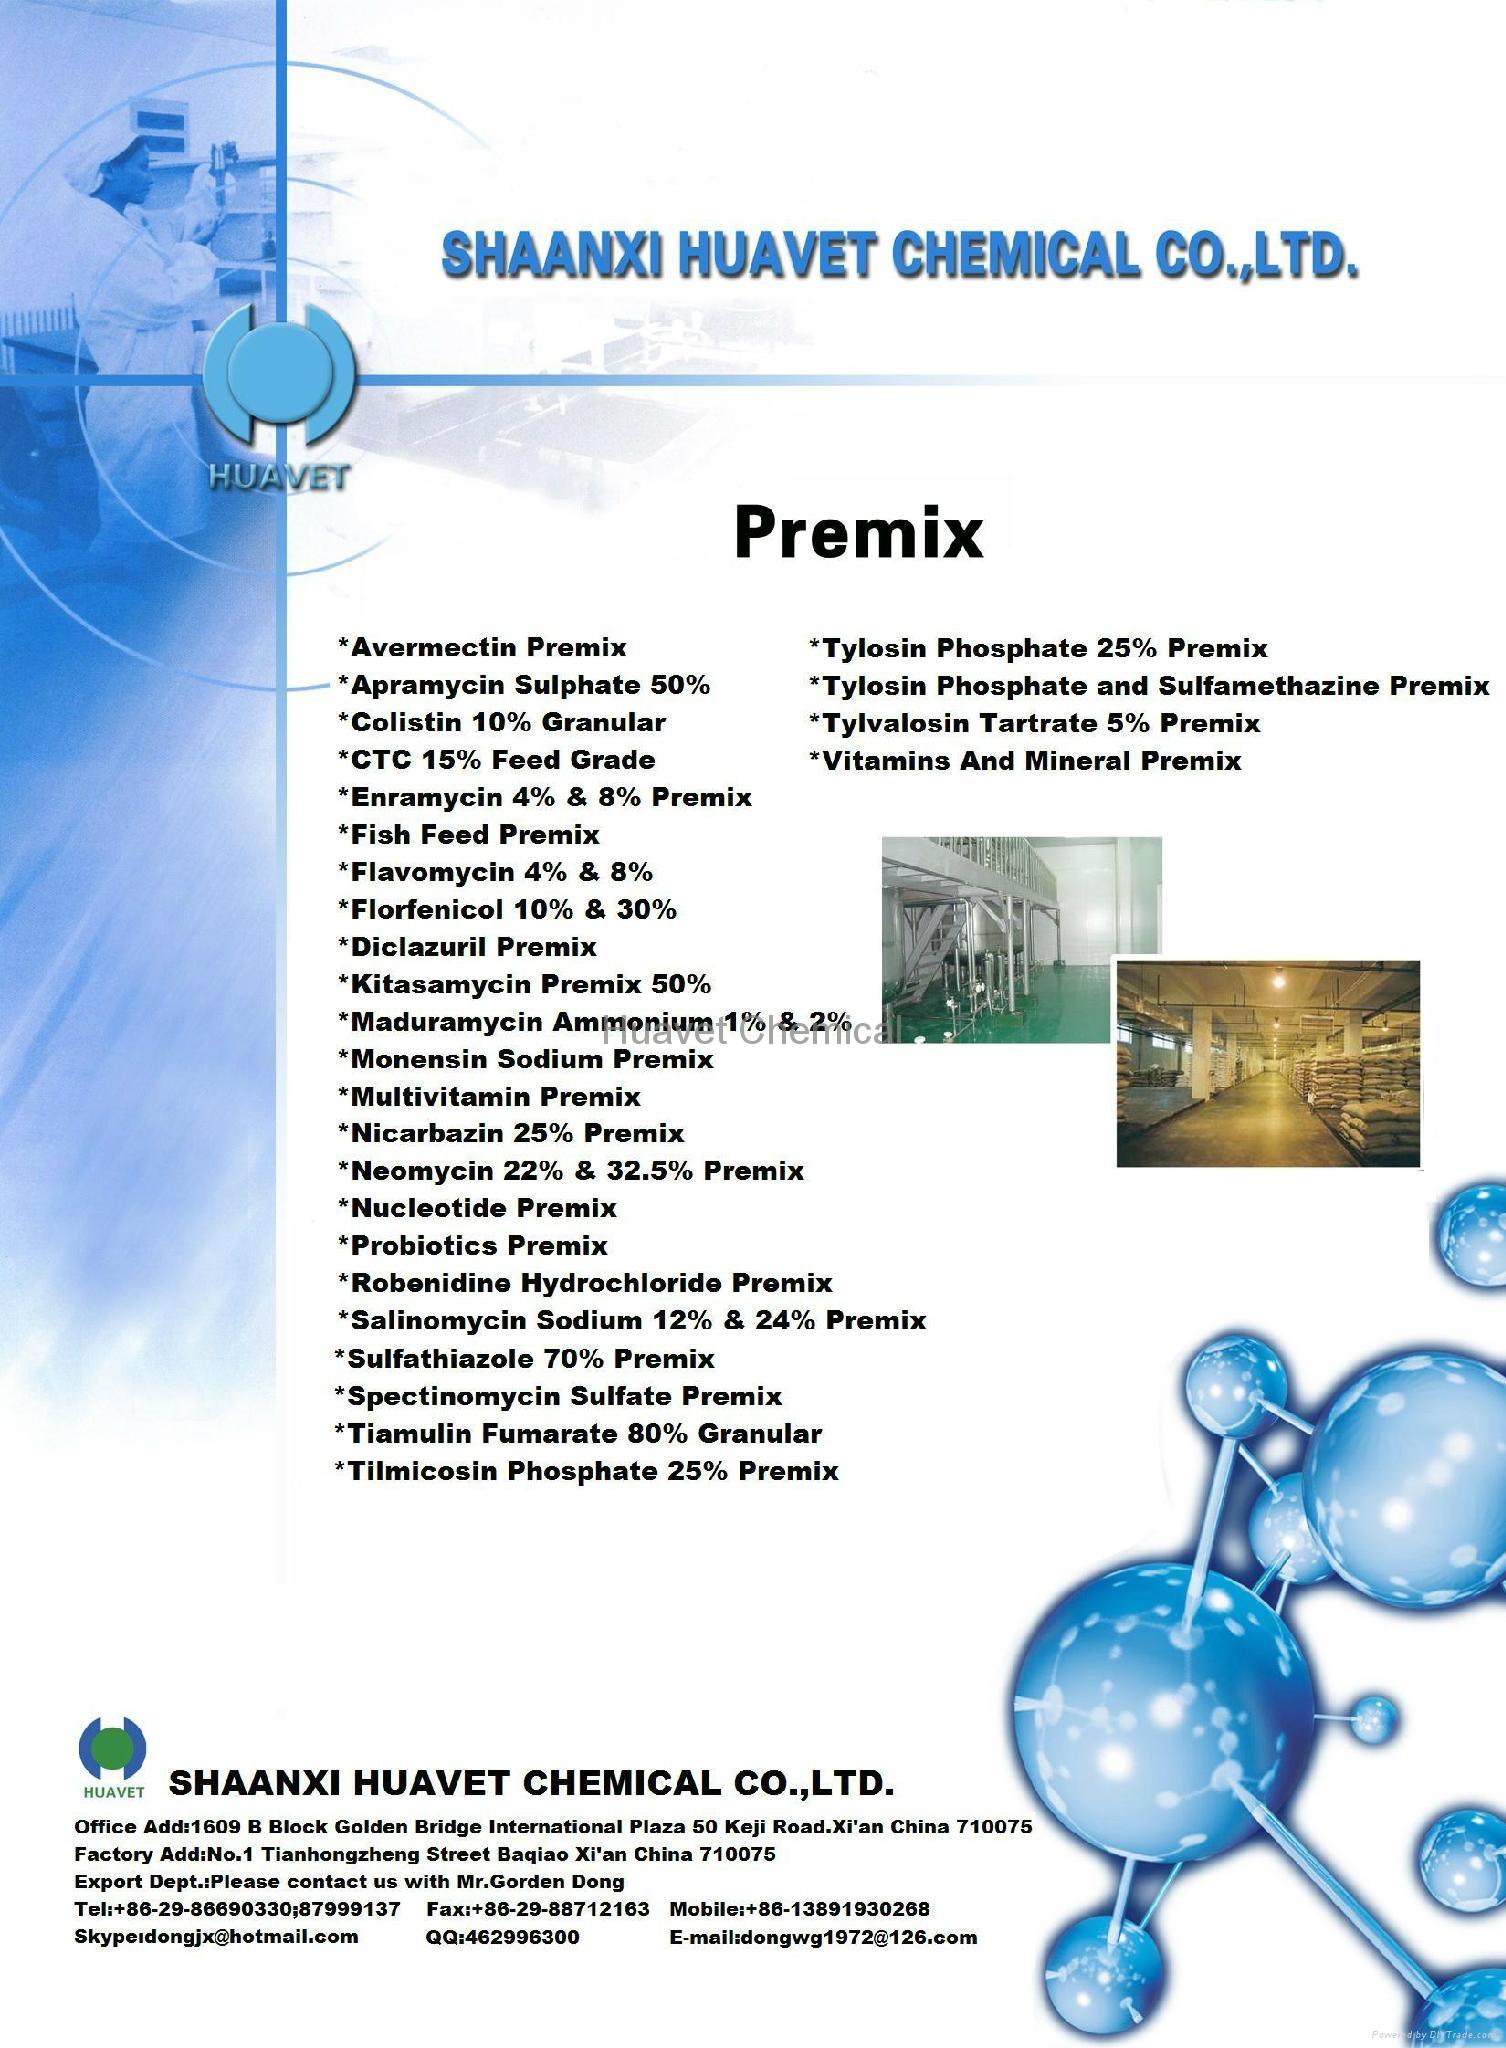 Bromhexin Hcl (CASNo.: 611-75-6) 3